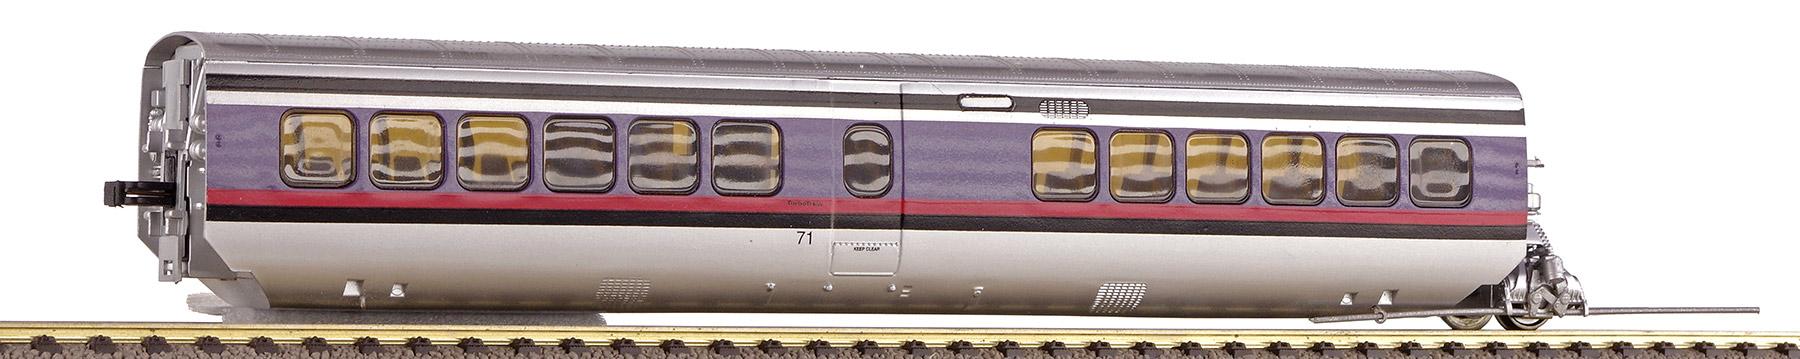 модель TRAIN 16045-85